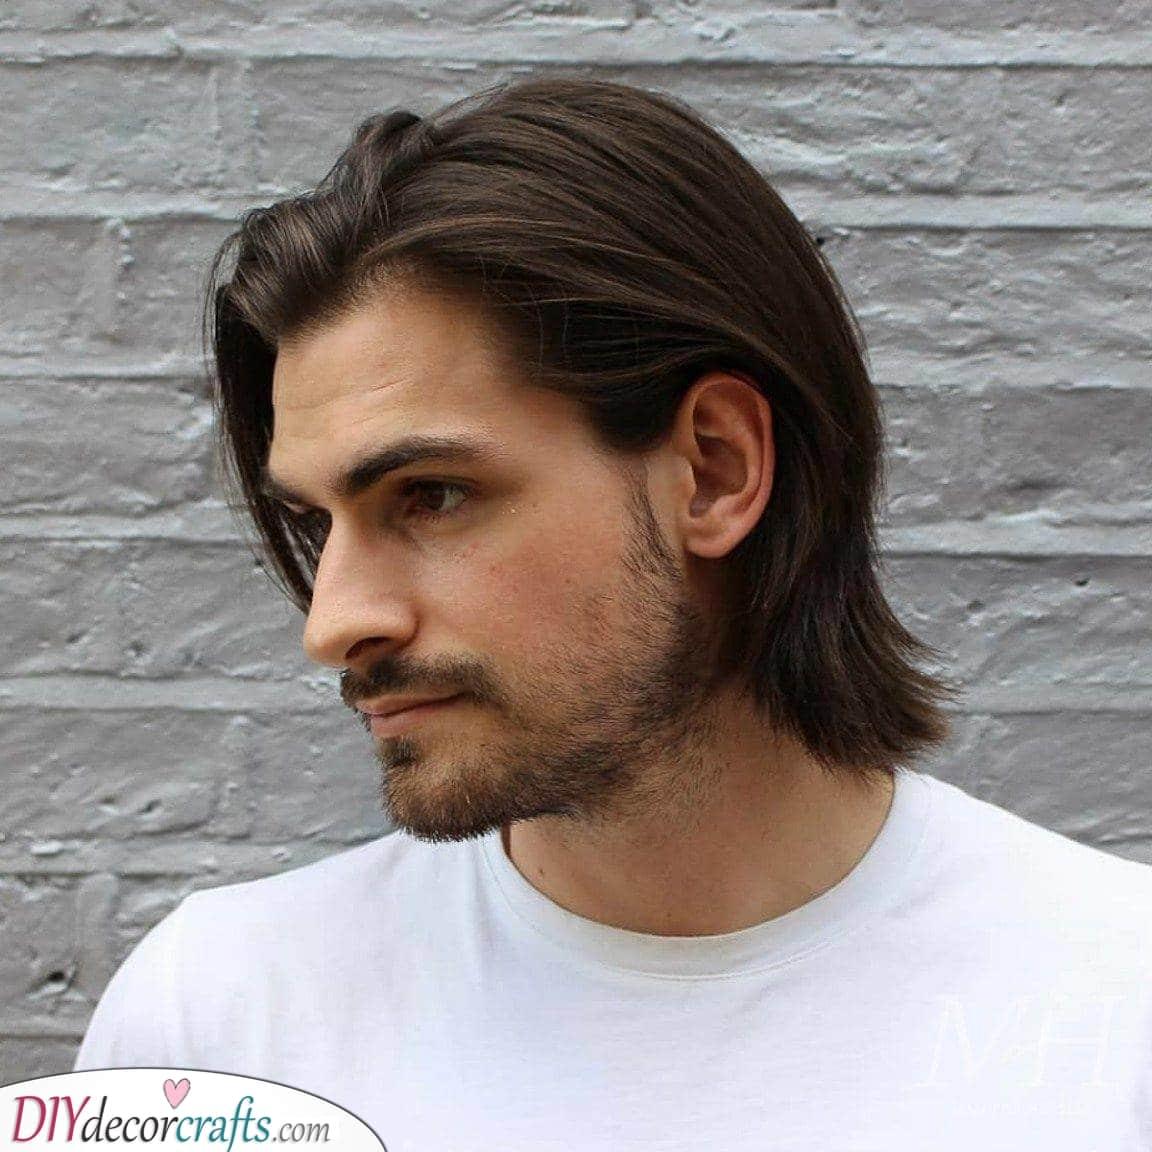 A Bit Longer - Stylish Medium Length Hairstyles for Men